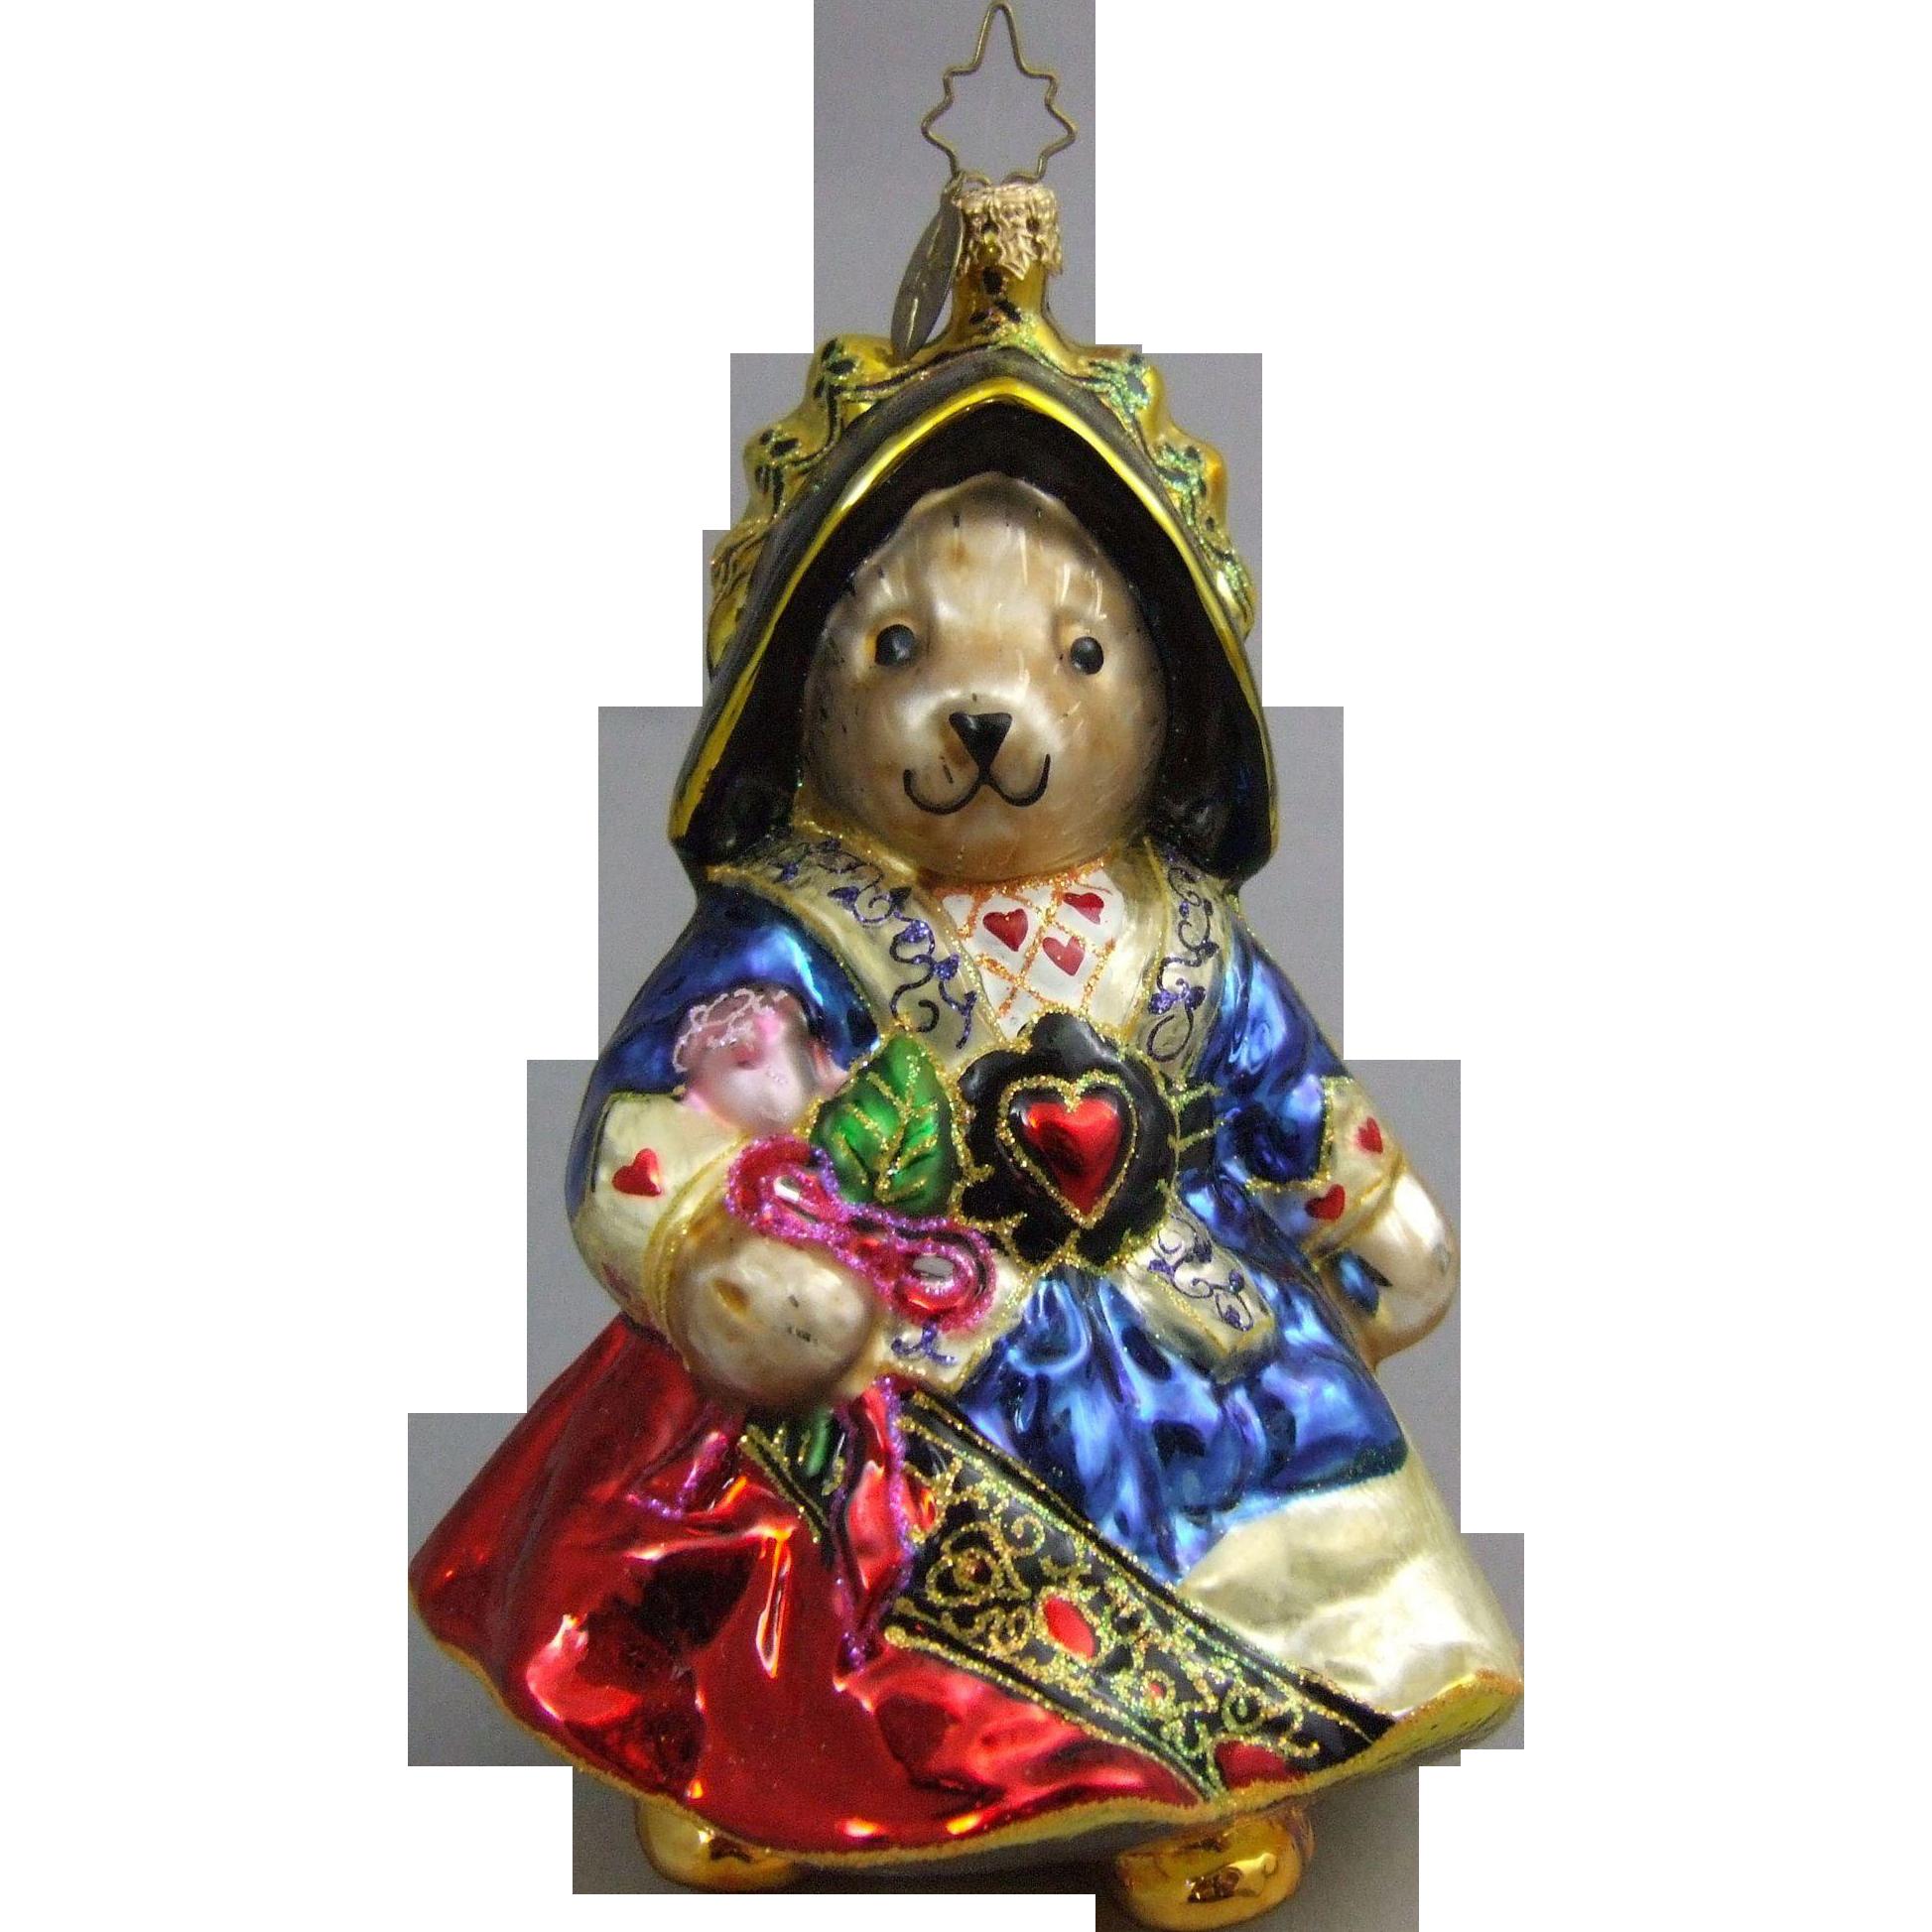 Christopher radko ornaments - Christopher Radko Christmas Ornament Retired Muffy Queen Of Hearts